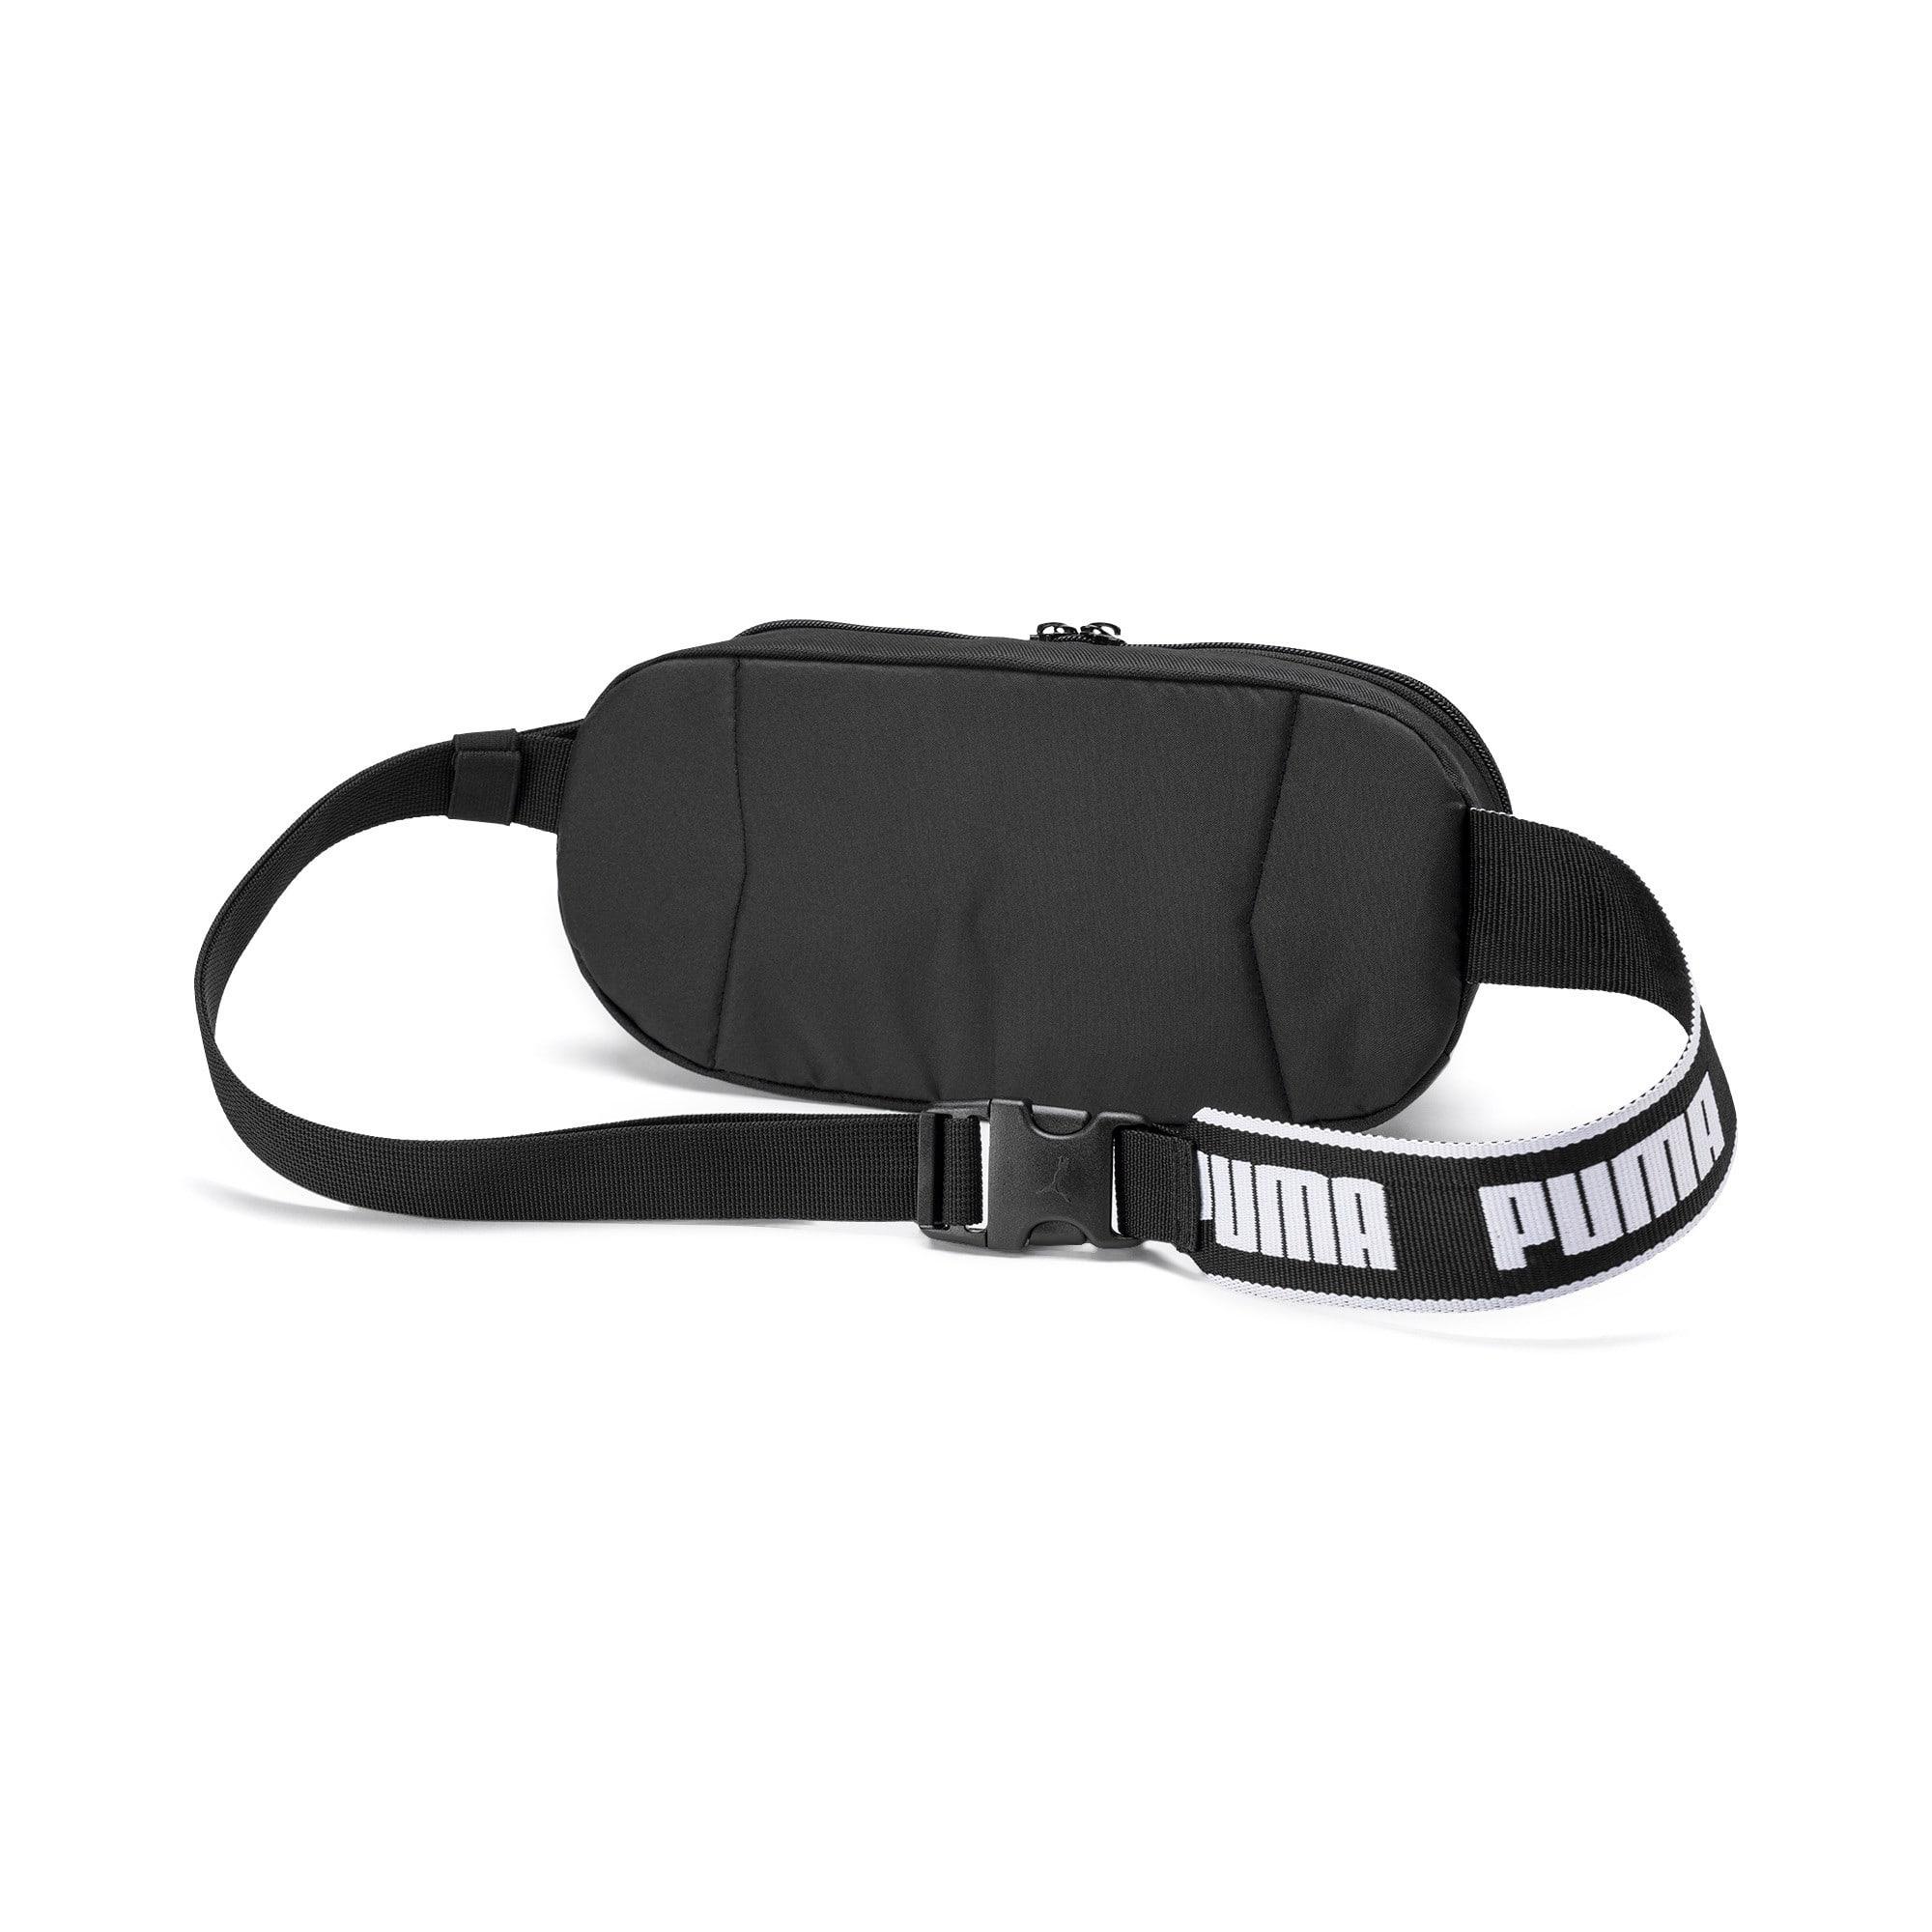 Thumbnail 2 of Sole Waist Bag, Puma Black, medium